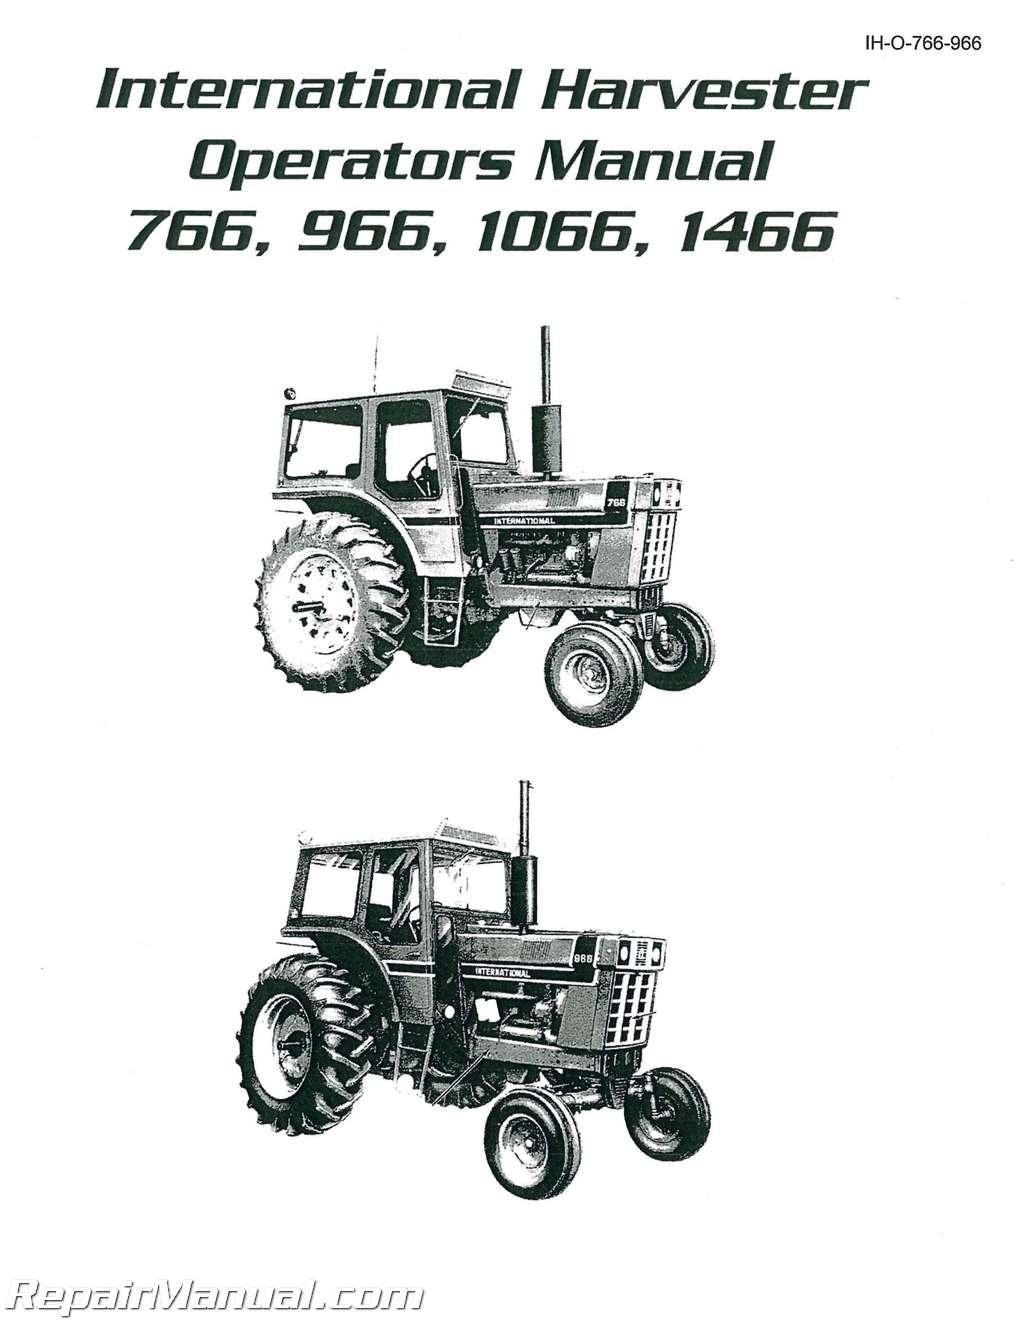 Ih 4200 Fuse Box Cover 22 Wiring Diagram Images Diagrams 2004 International 7681024 Harvester 766 966 1066 1466 Diesel Operators Manual 001resize